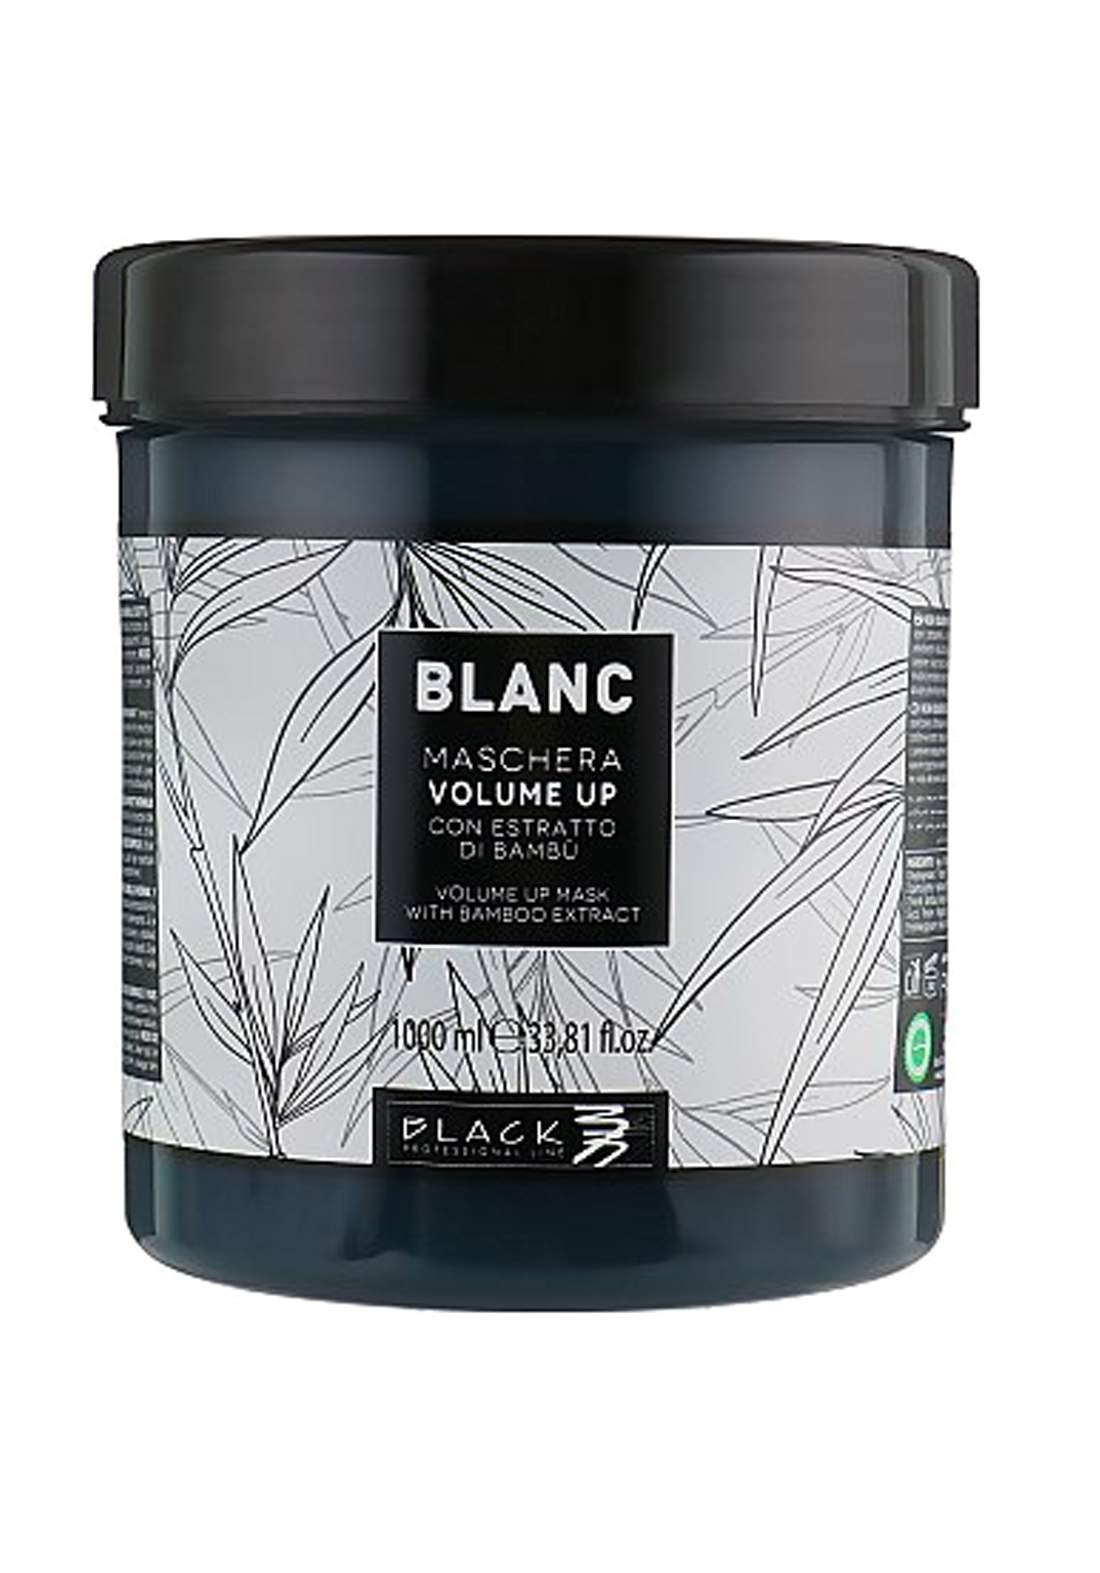 Black Professional Line Blanc Volume Up Mask 1000ml ماسك للشعر